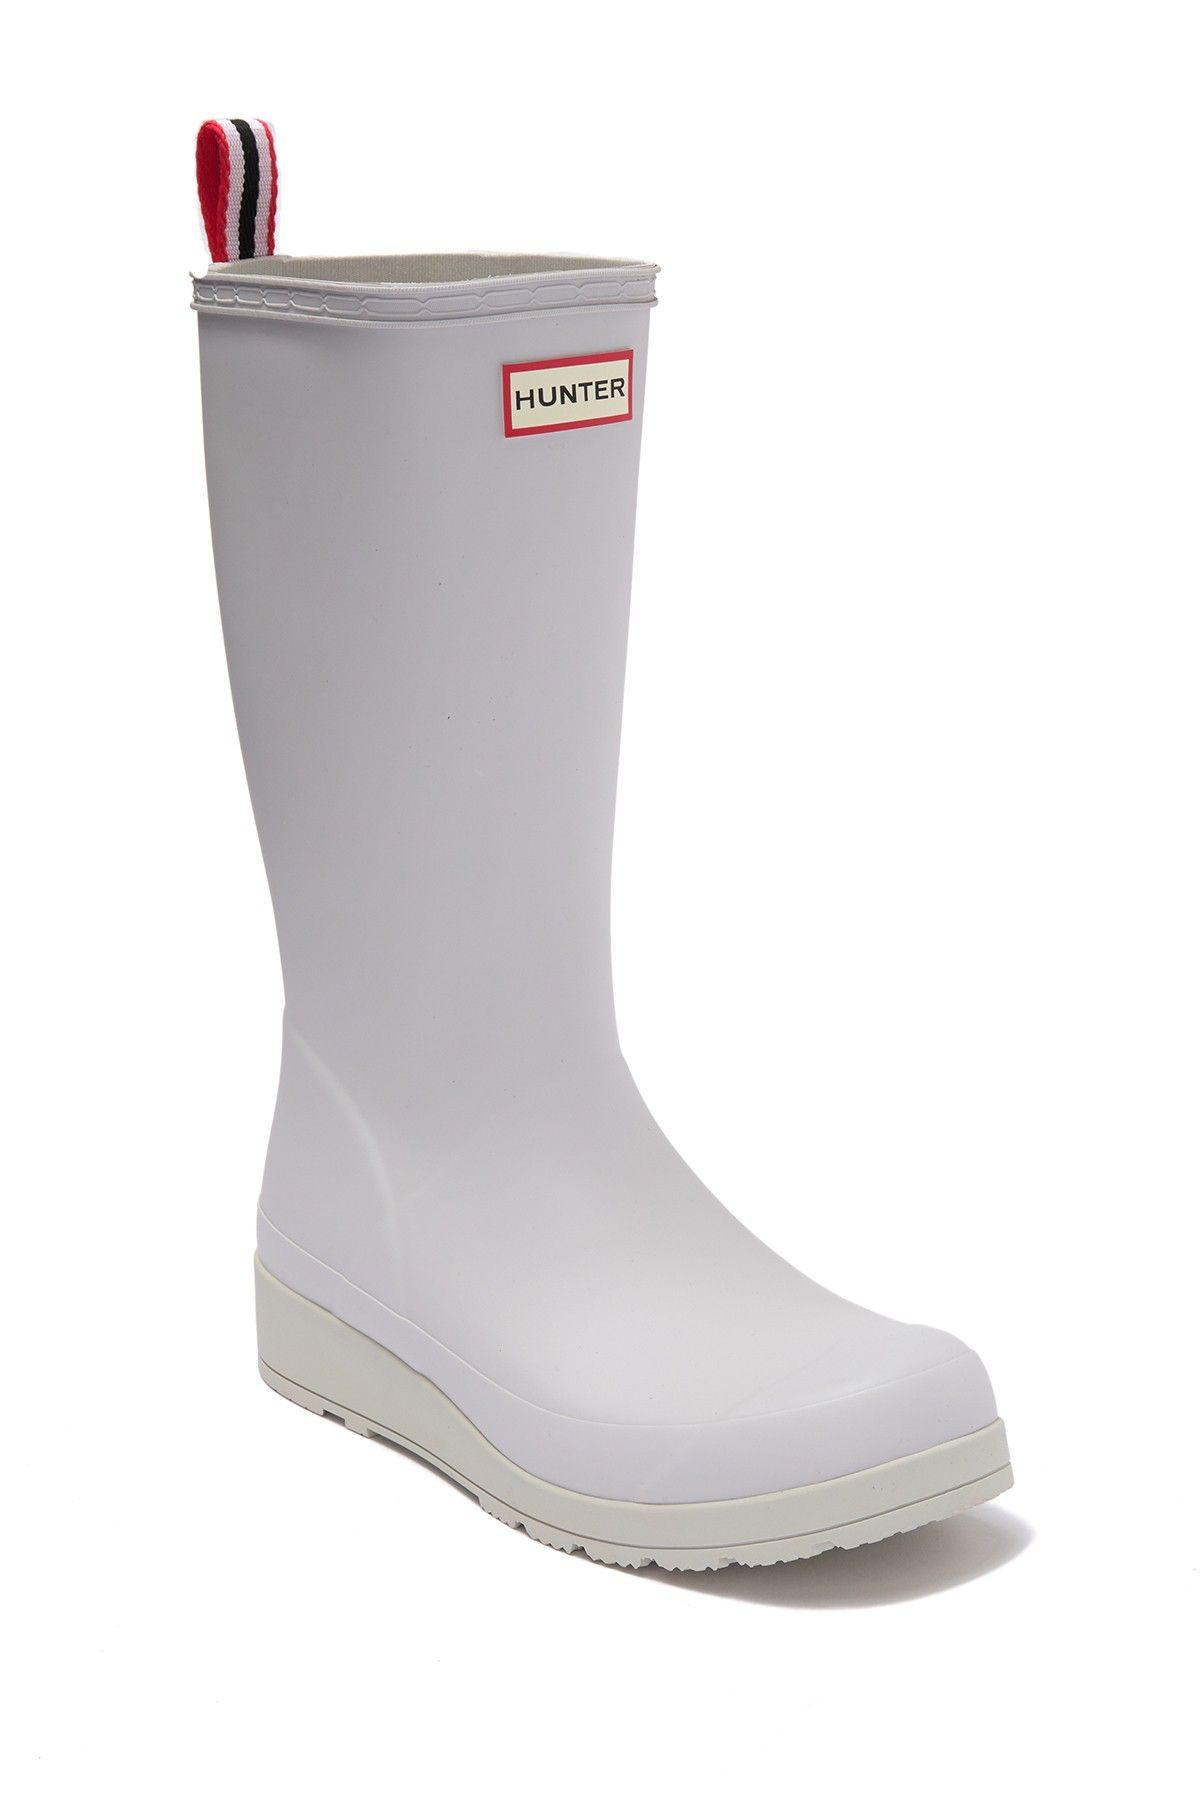 Hunter Original Play Tall Waterproof Rain Boot Rain Boots